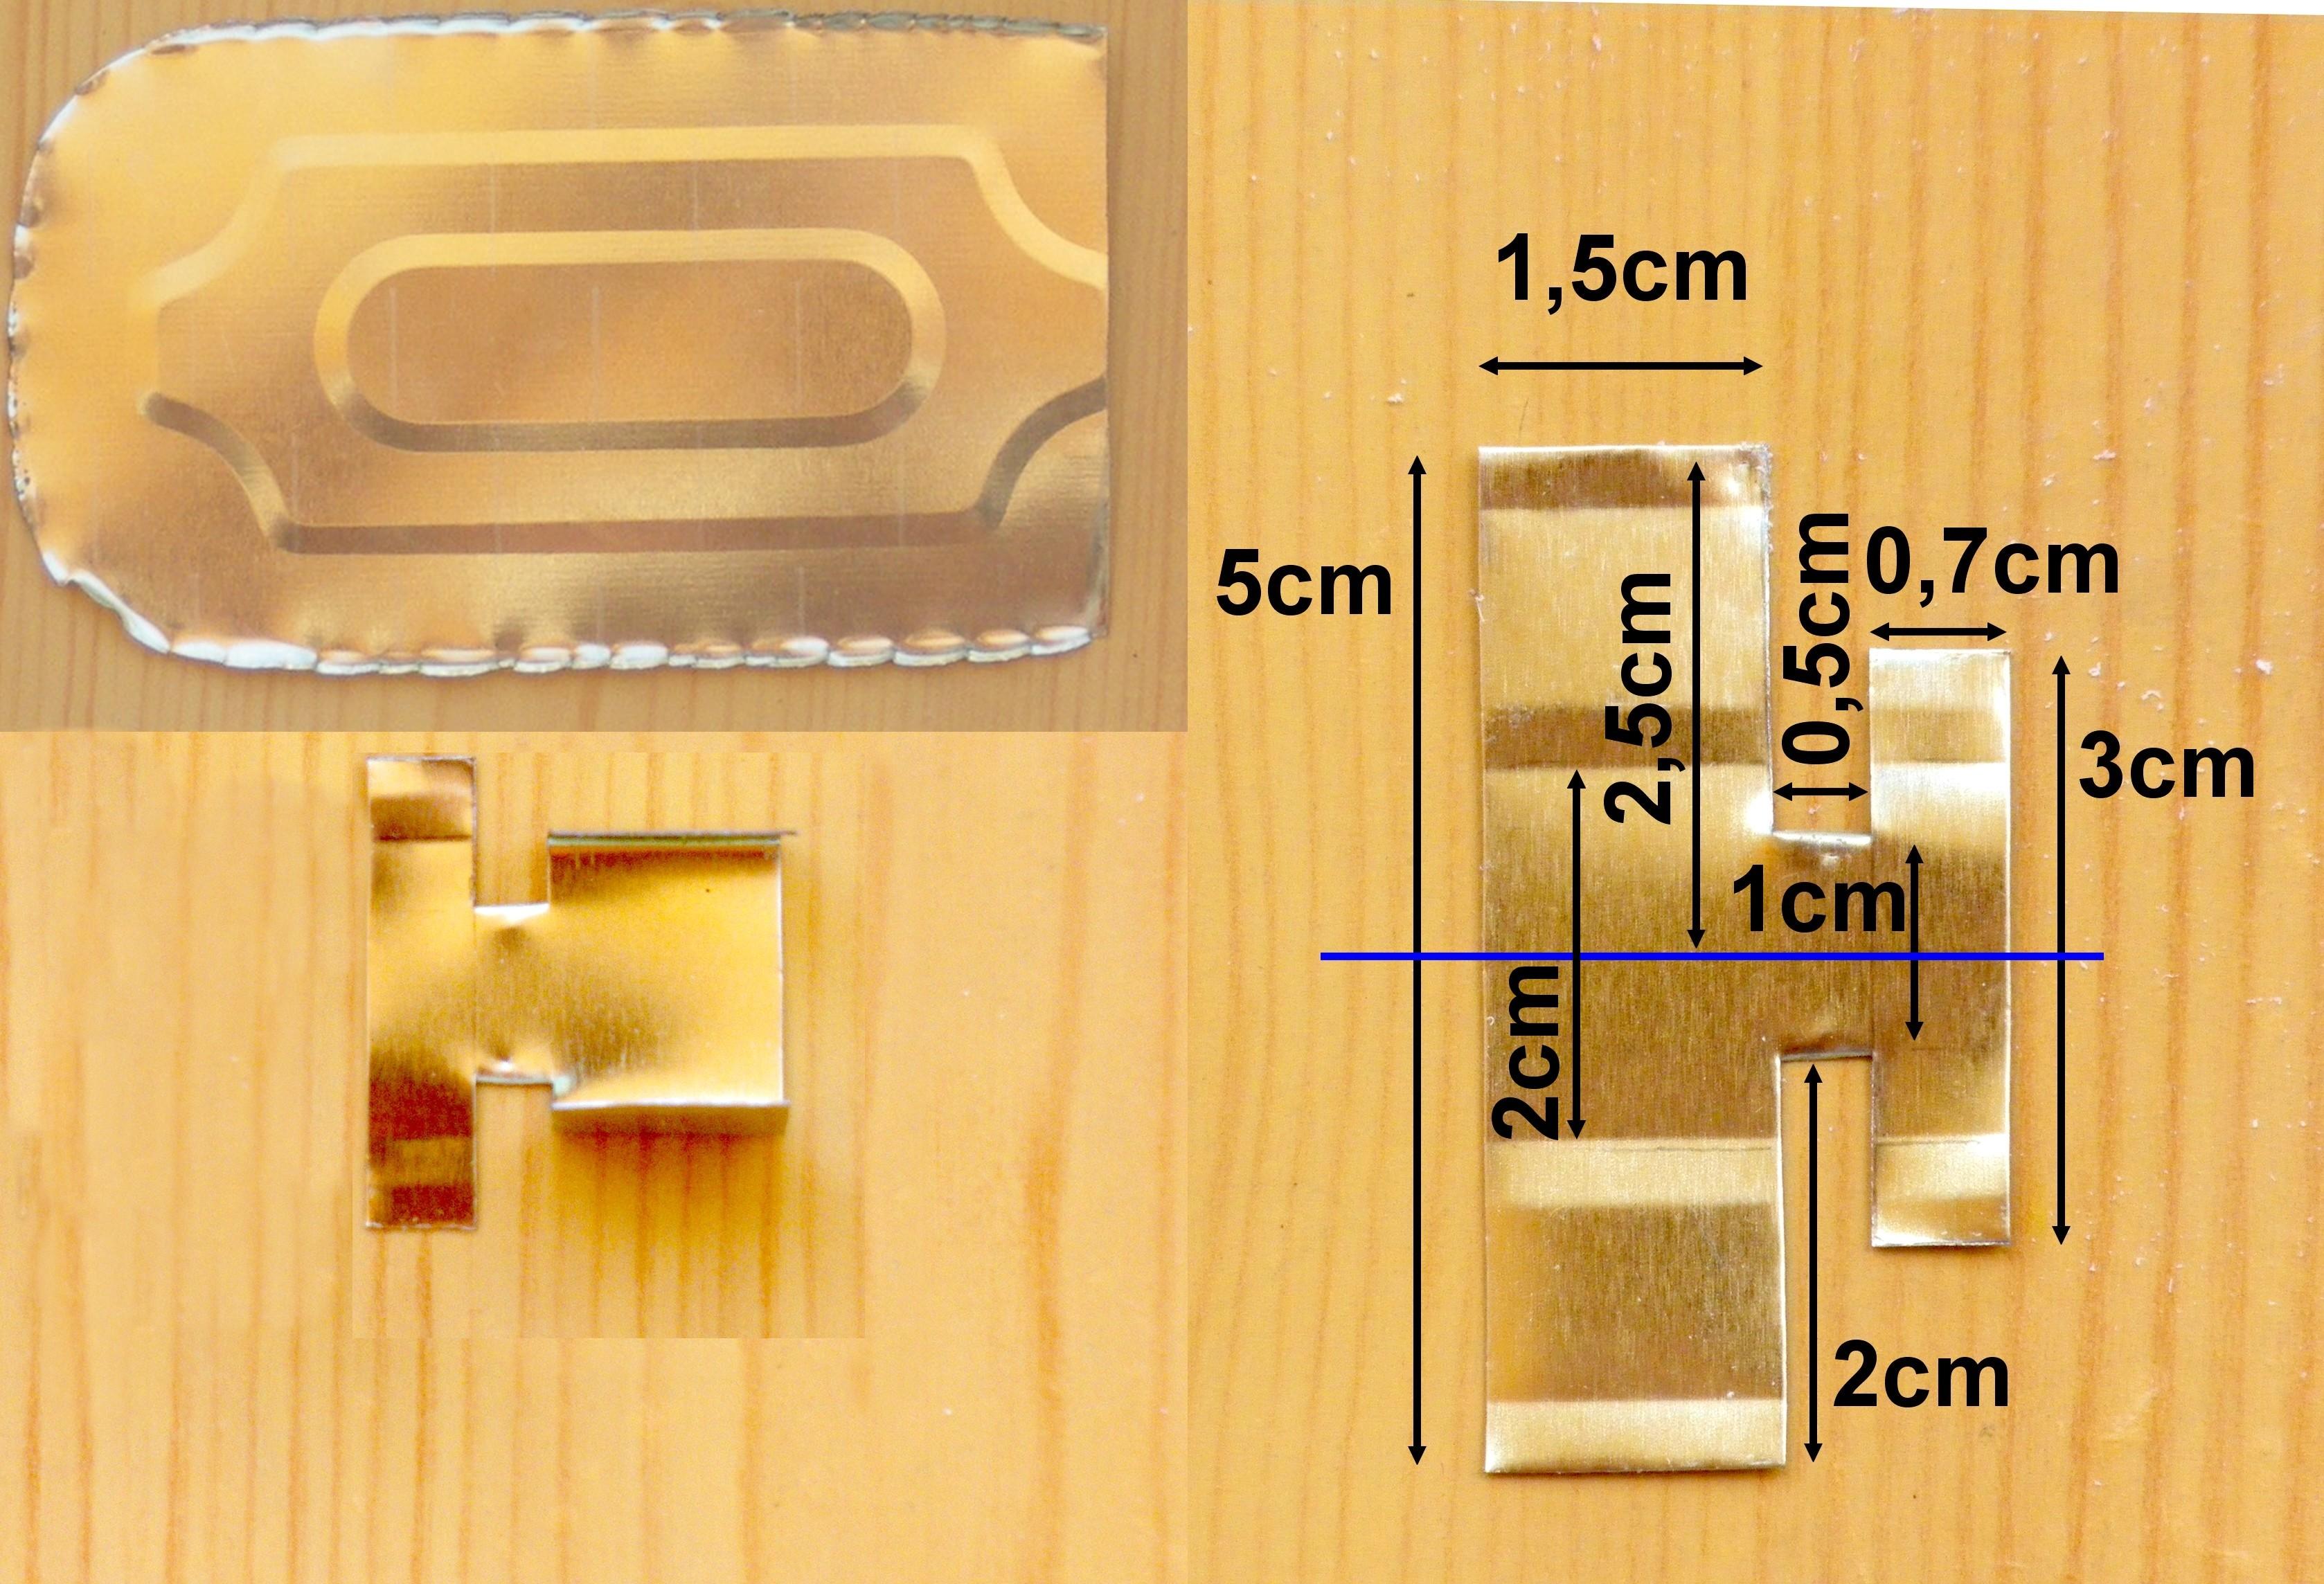 i.ibb.co/LkHd1zg/chapa-conector-medidas.jpg